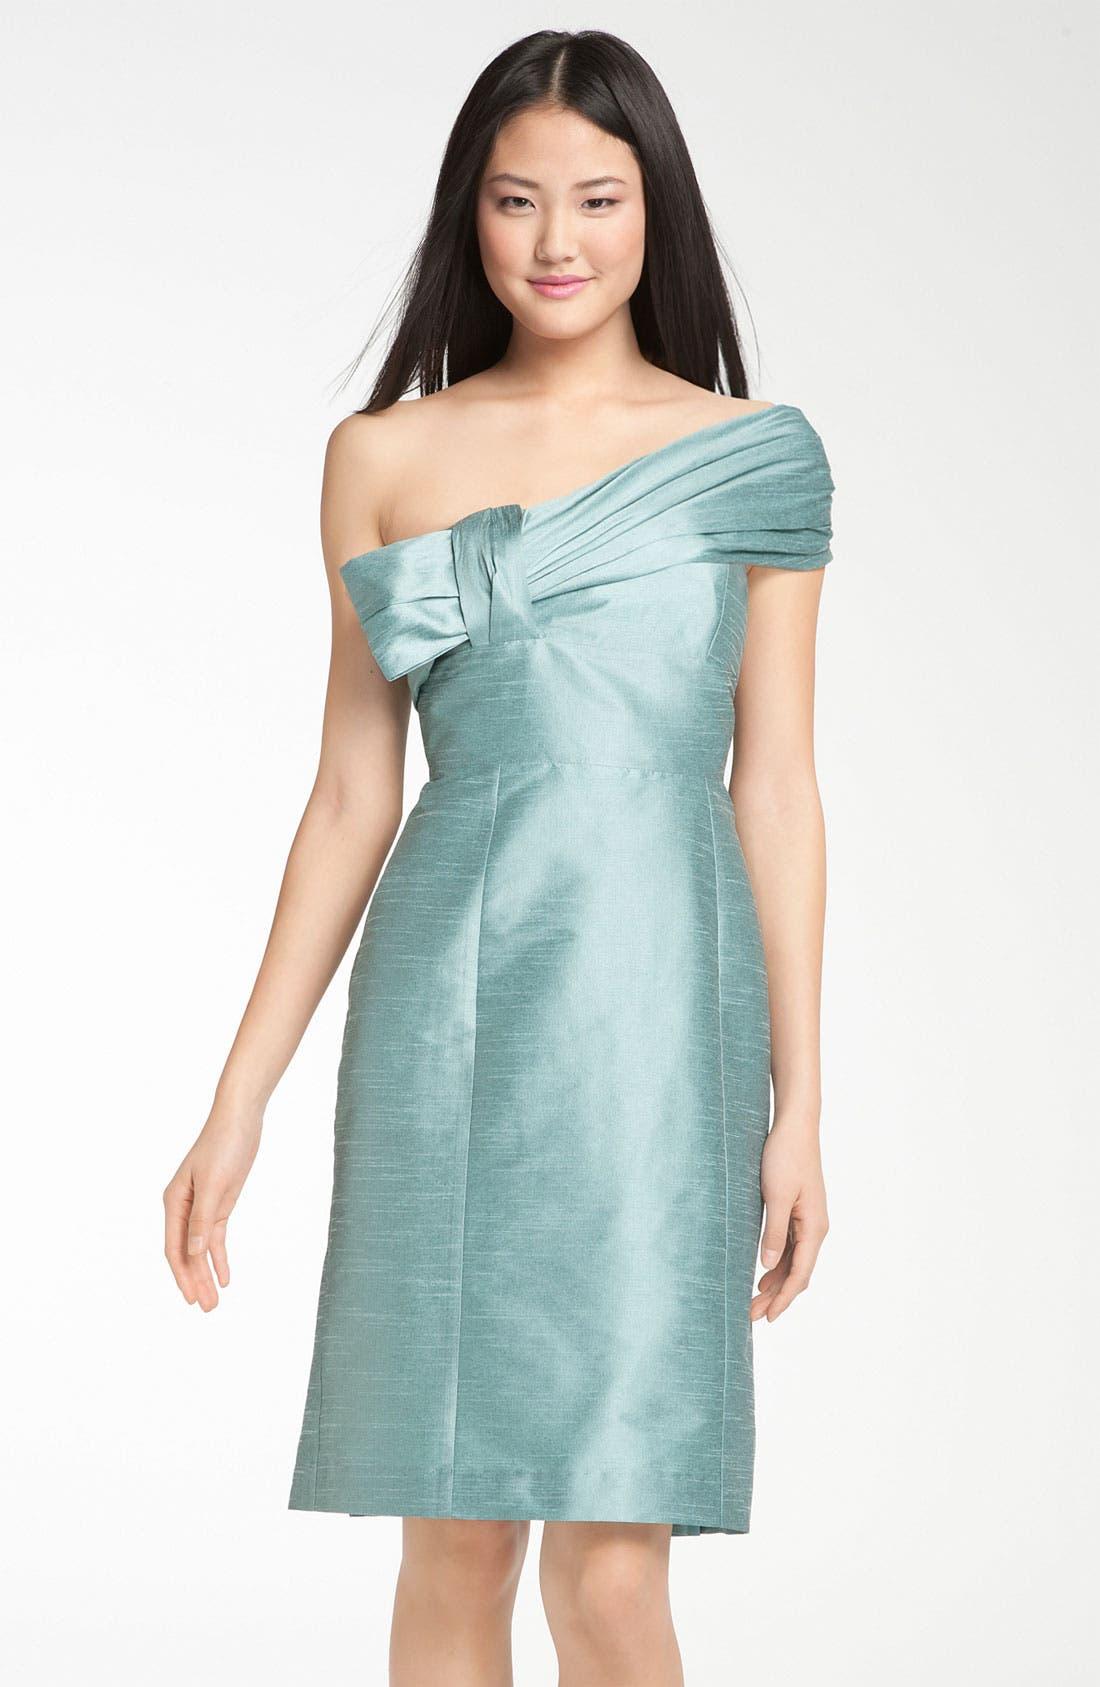 Alternate Image 1 Selected - Anna Elyse Bridesmaids Convertible Shantung Dress